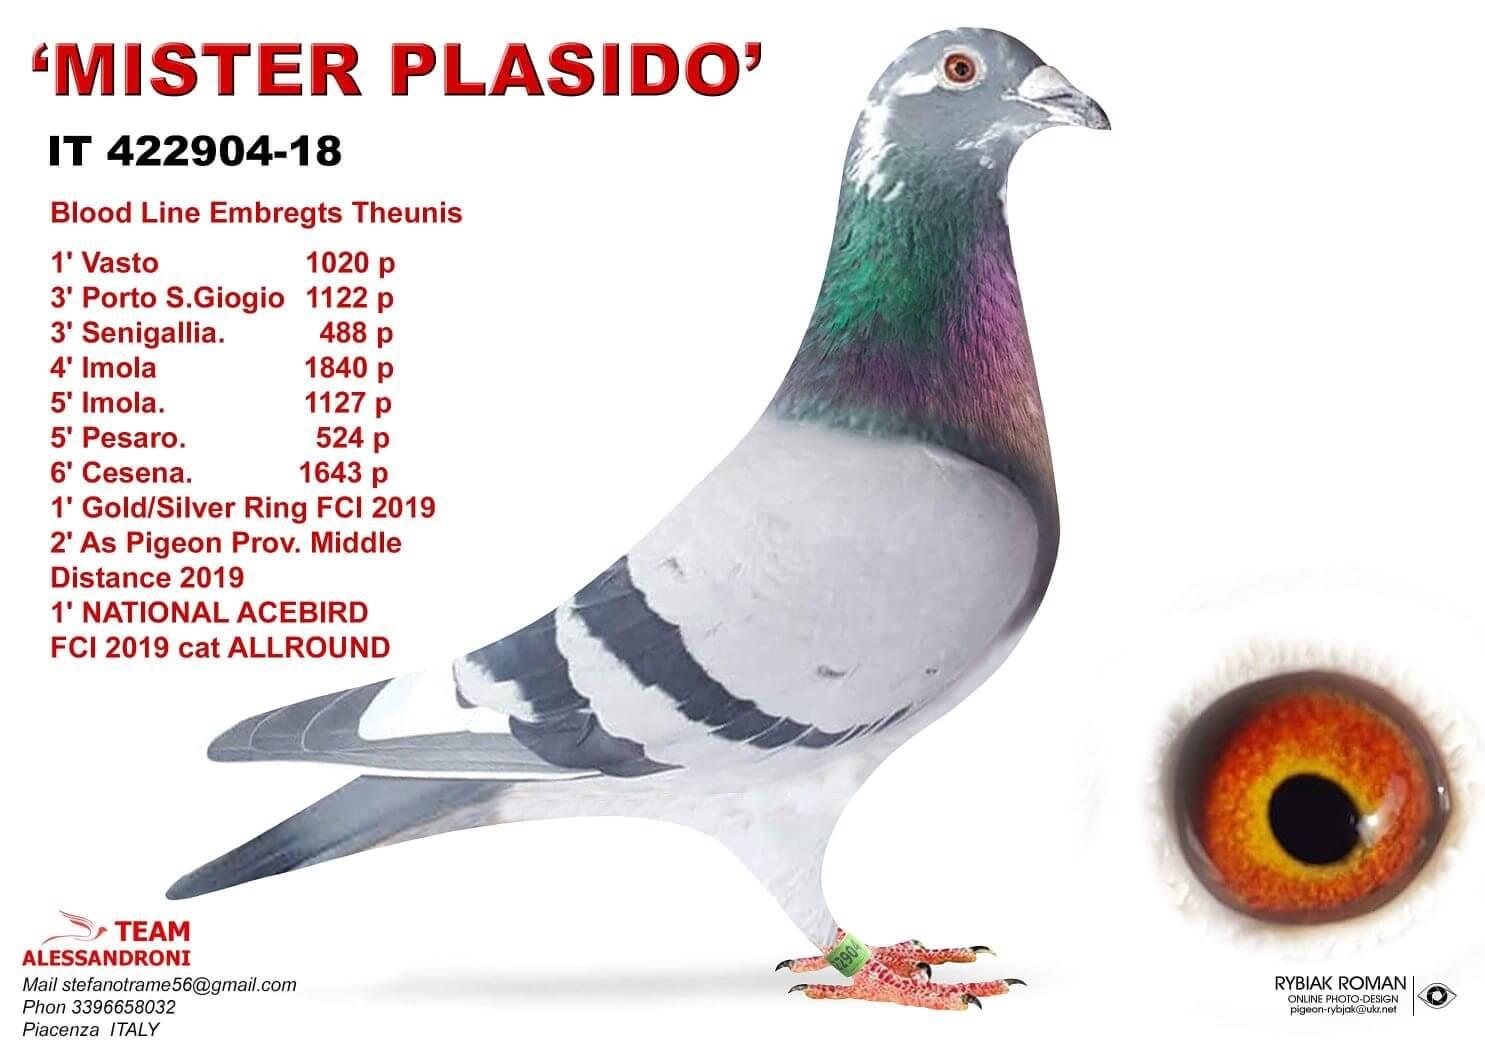 mister-plasido-it-422904-18